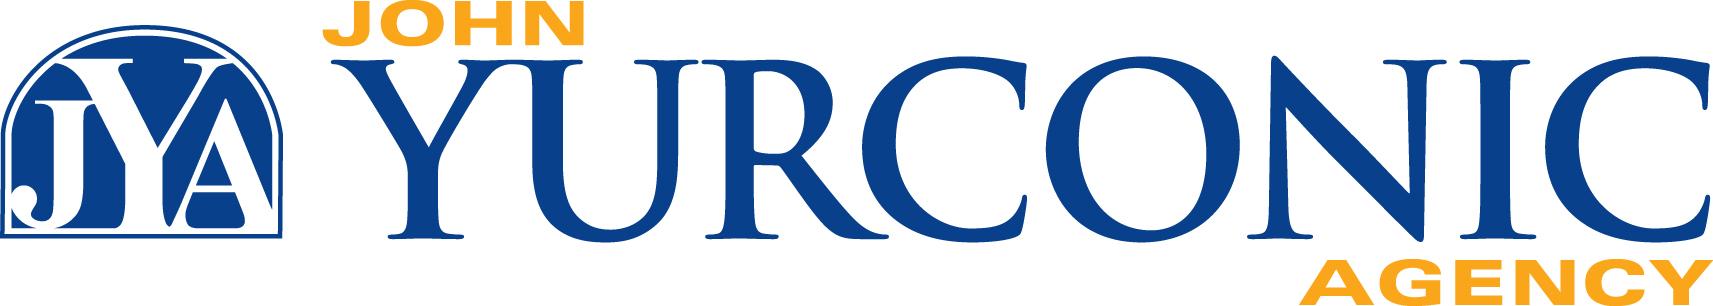 John Yurconic Insurance Agency Logo